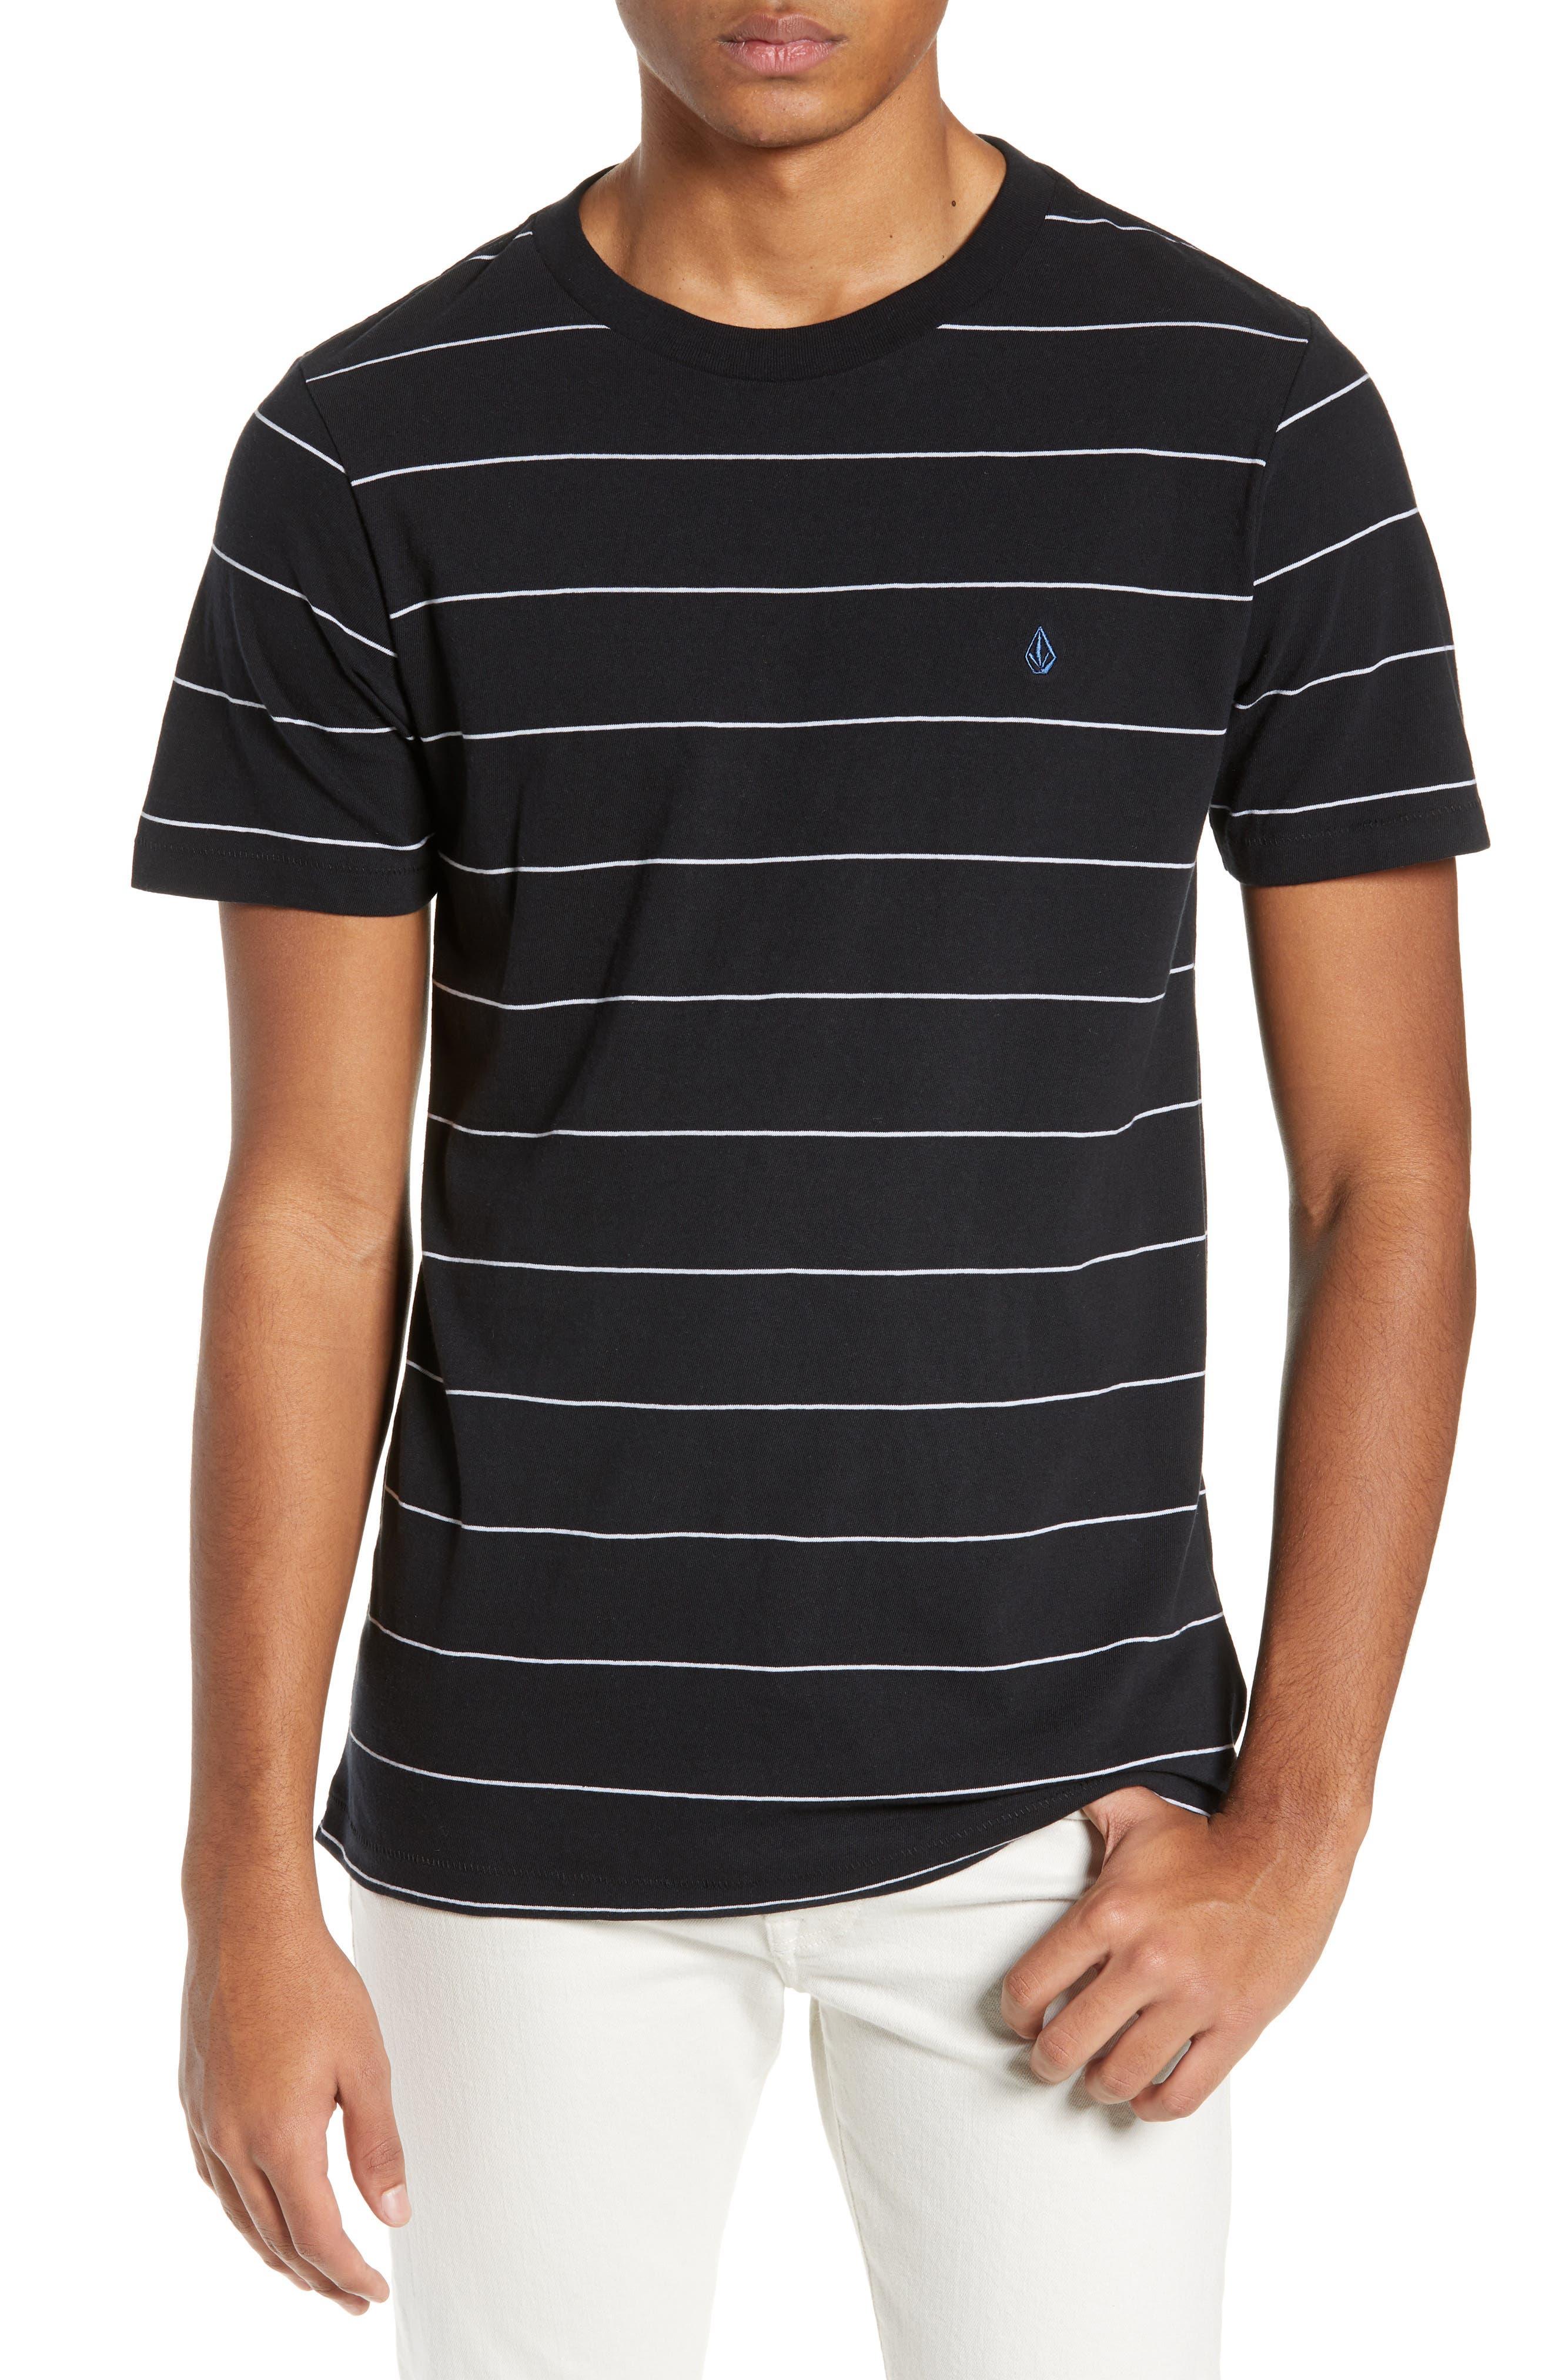 Joben Striped T-Shirt,                         Main,                         color, BLACK